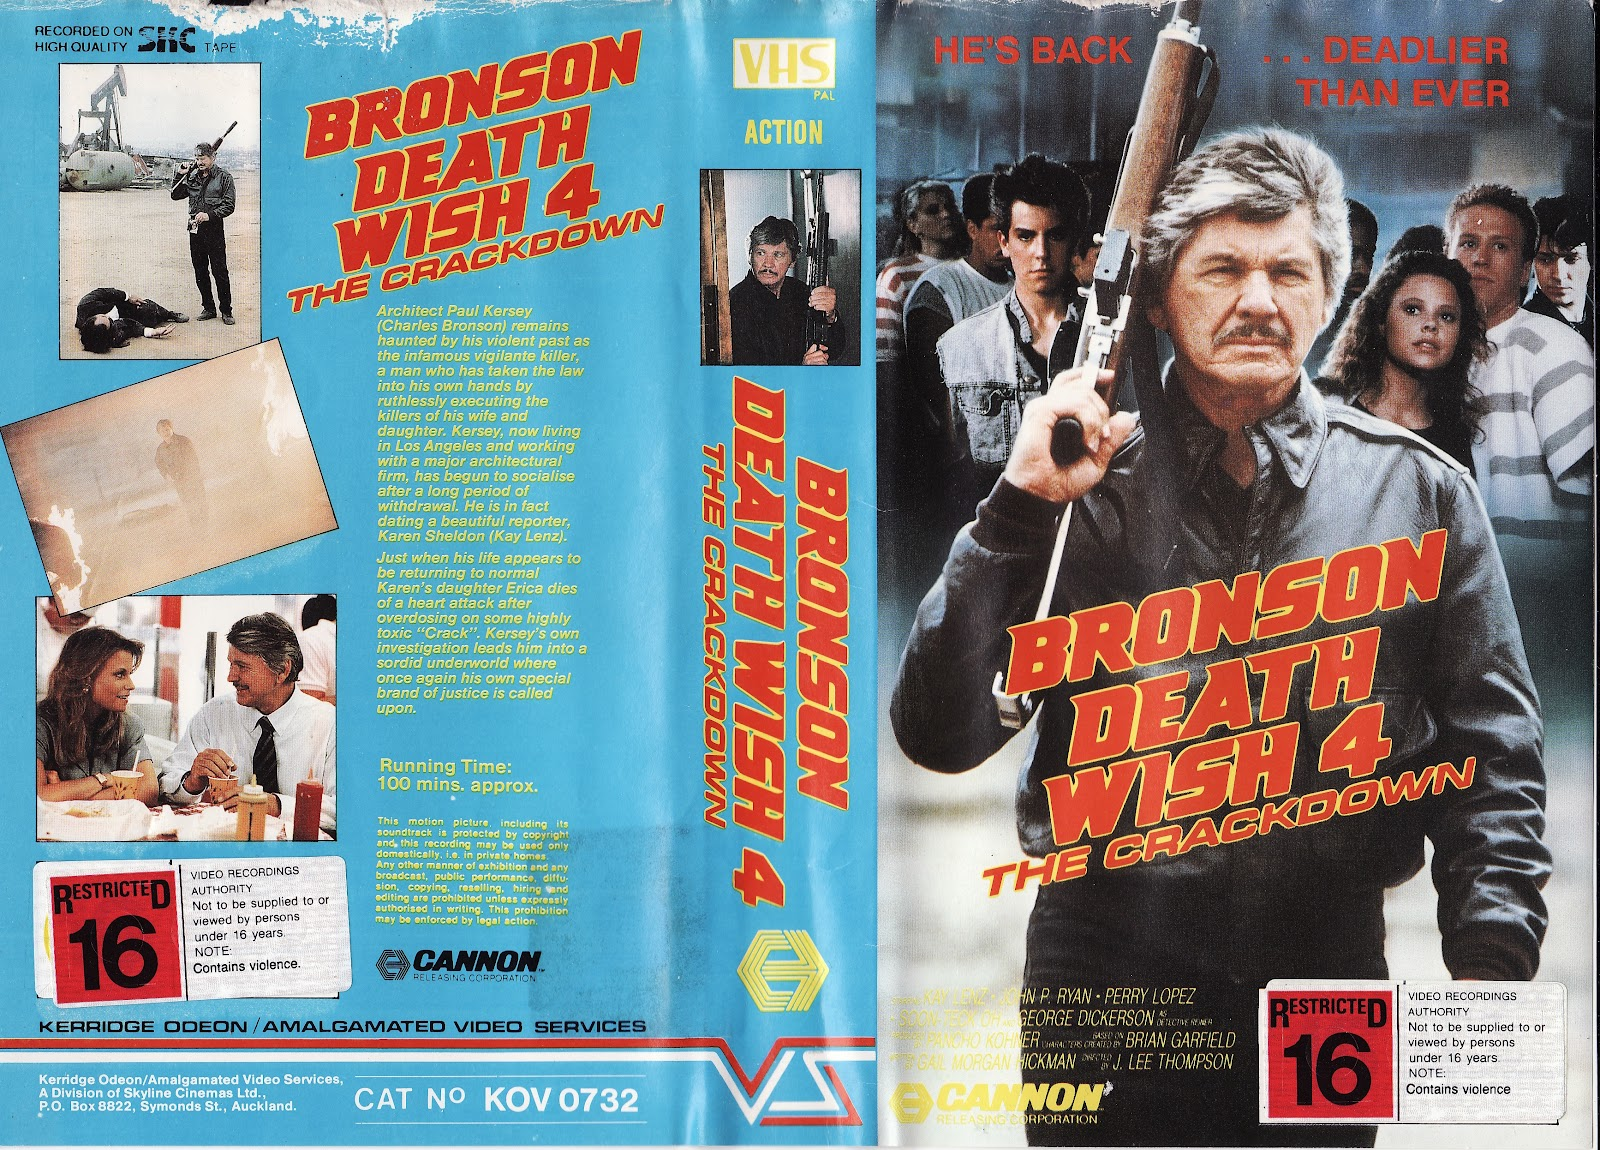 Bronson Death Wish 4 of 87 11 Death Wish 4